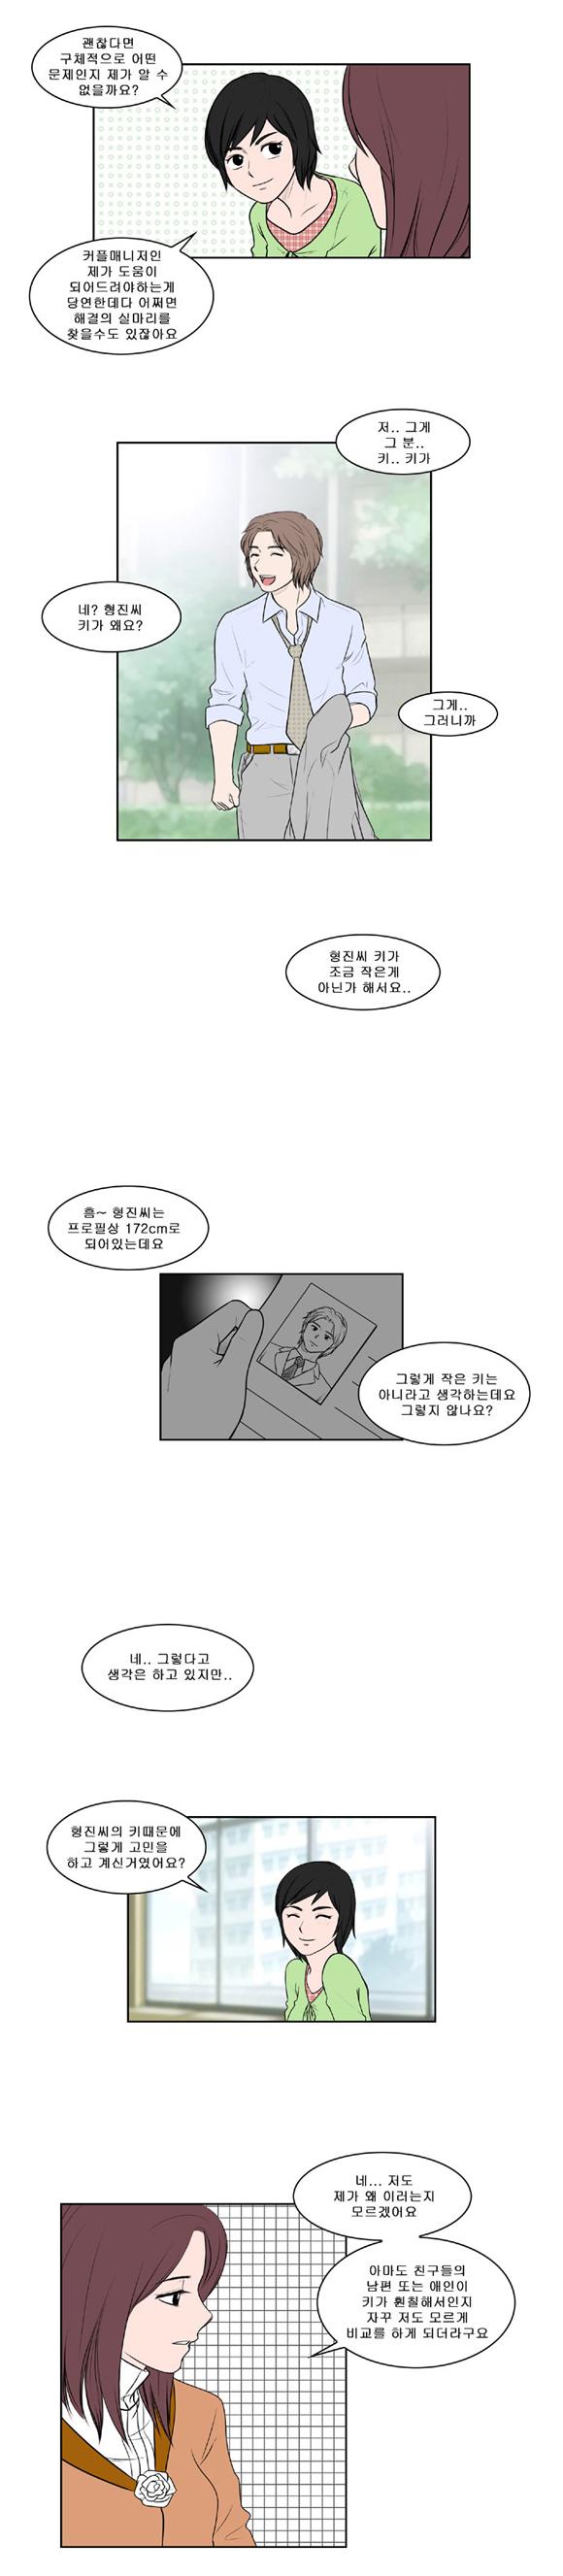 duocartoon_03_04.jpg